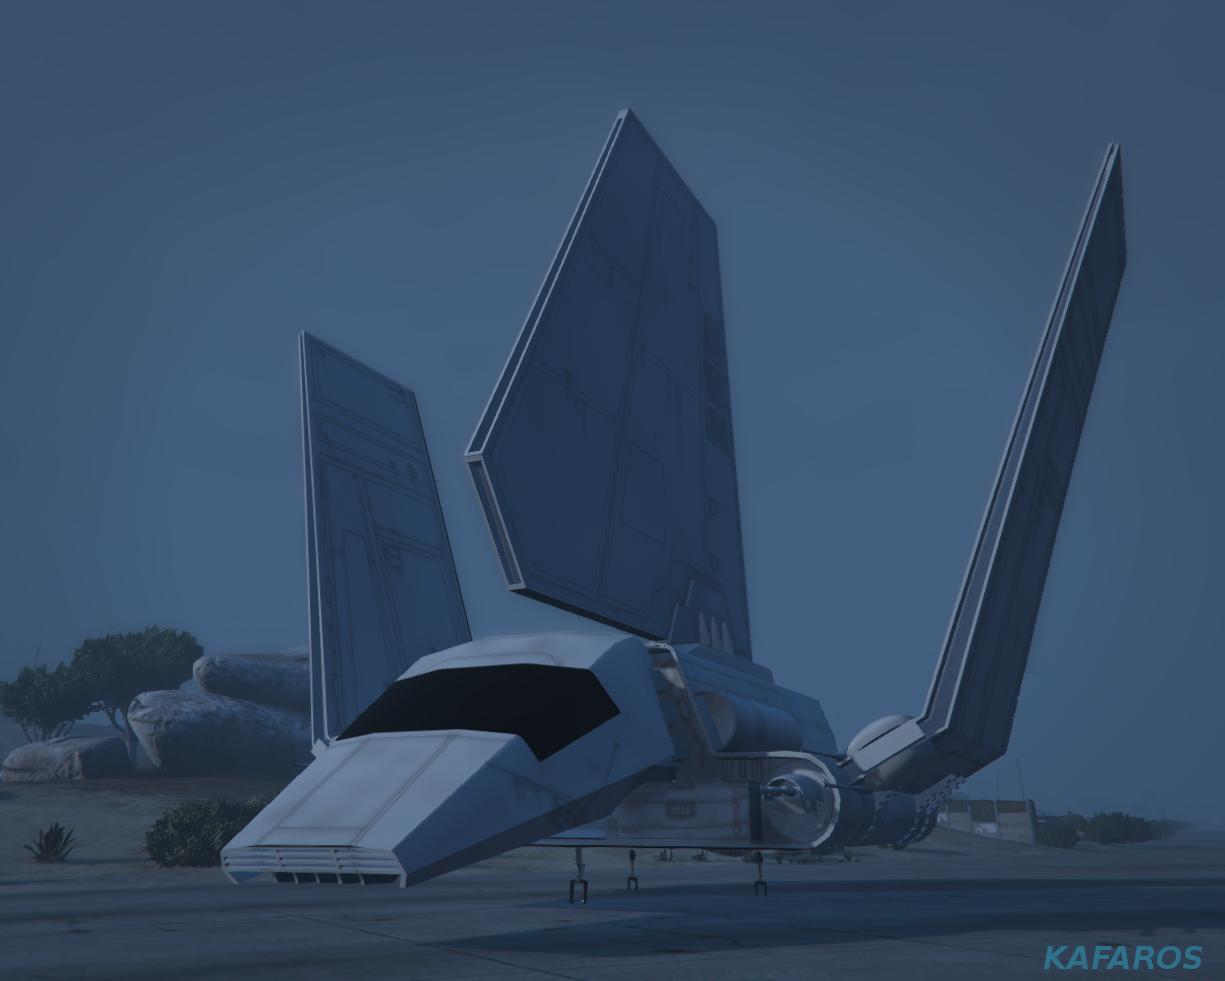 Star wars imperial shuttle tydirium gta5 mods com